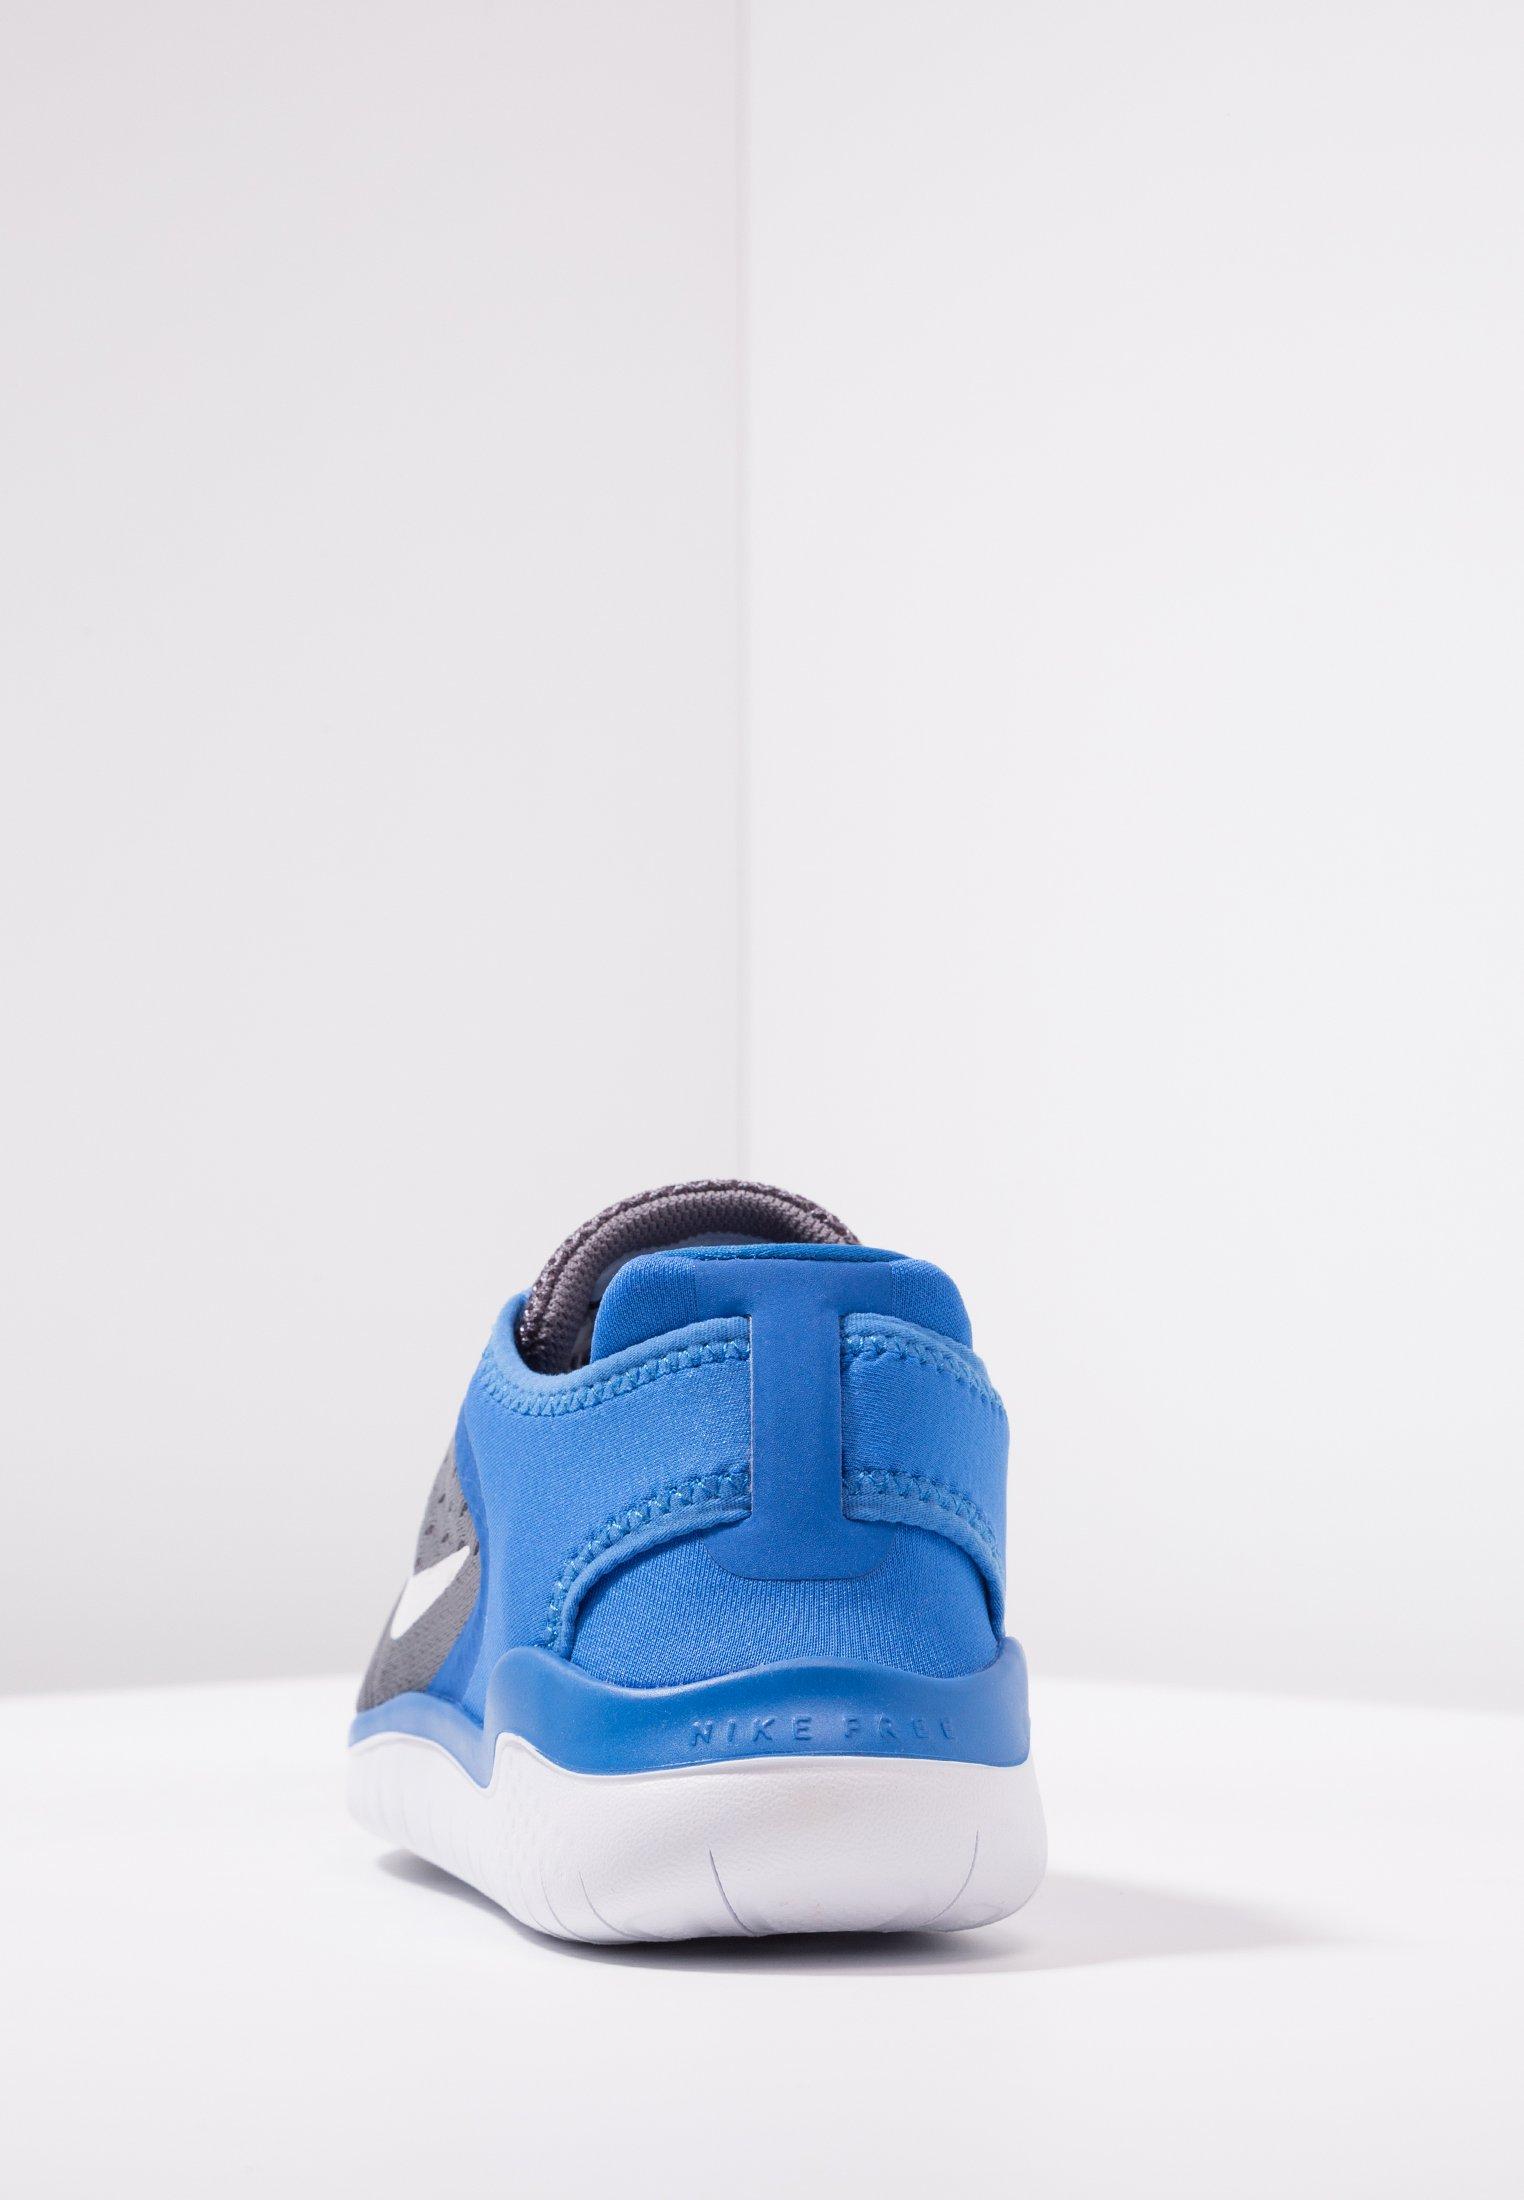 FREE RN 2018 Trainers gunsmokewhitesignal bluethunder grey